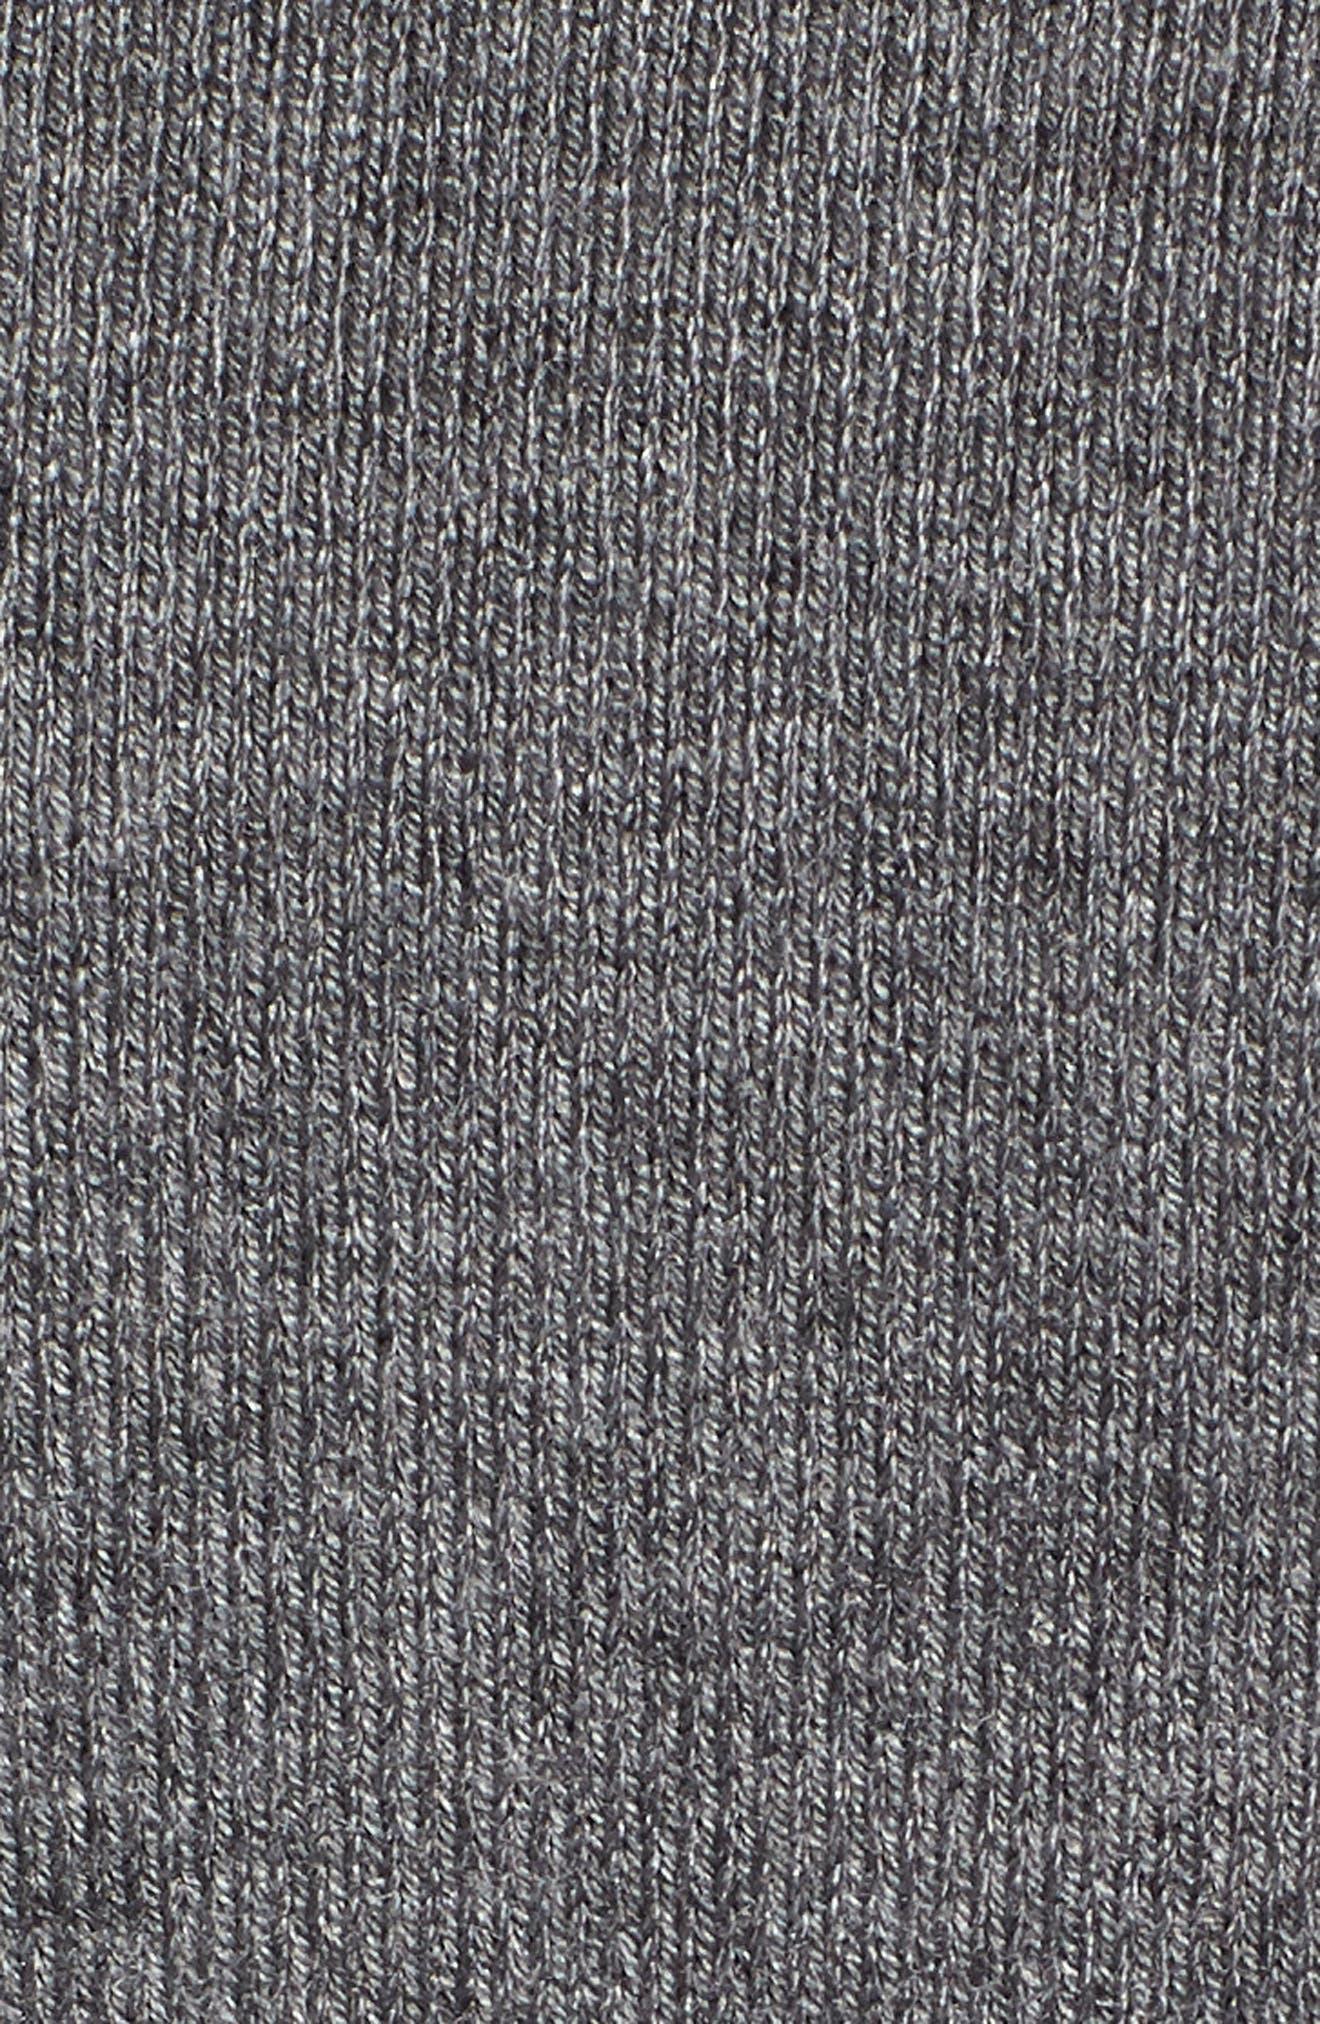 Sporty Stripe Sweater,                             Alternate thumbnail 6, color,                             021